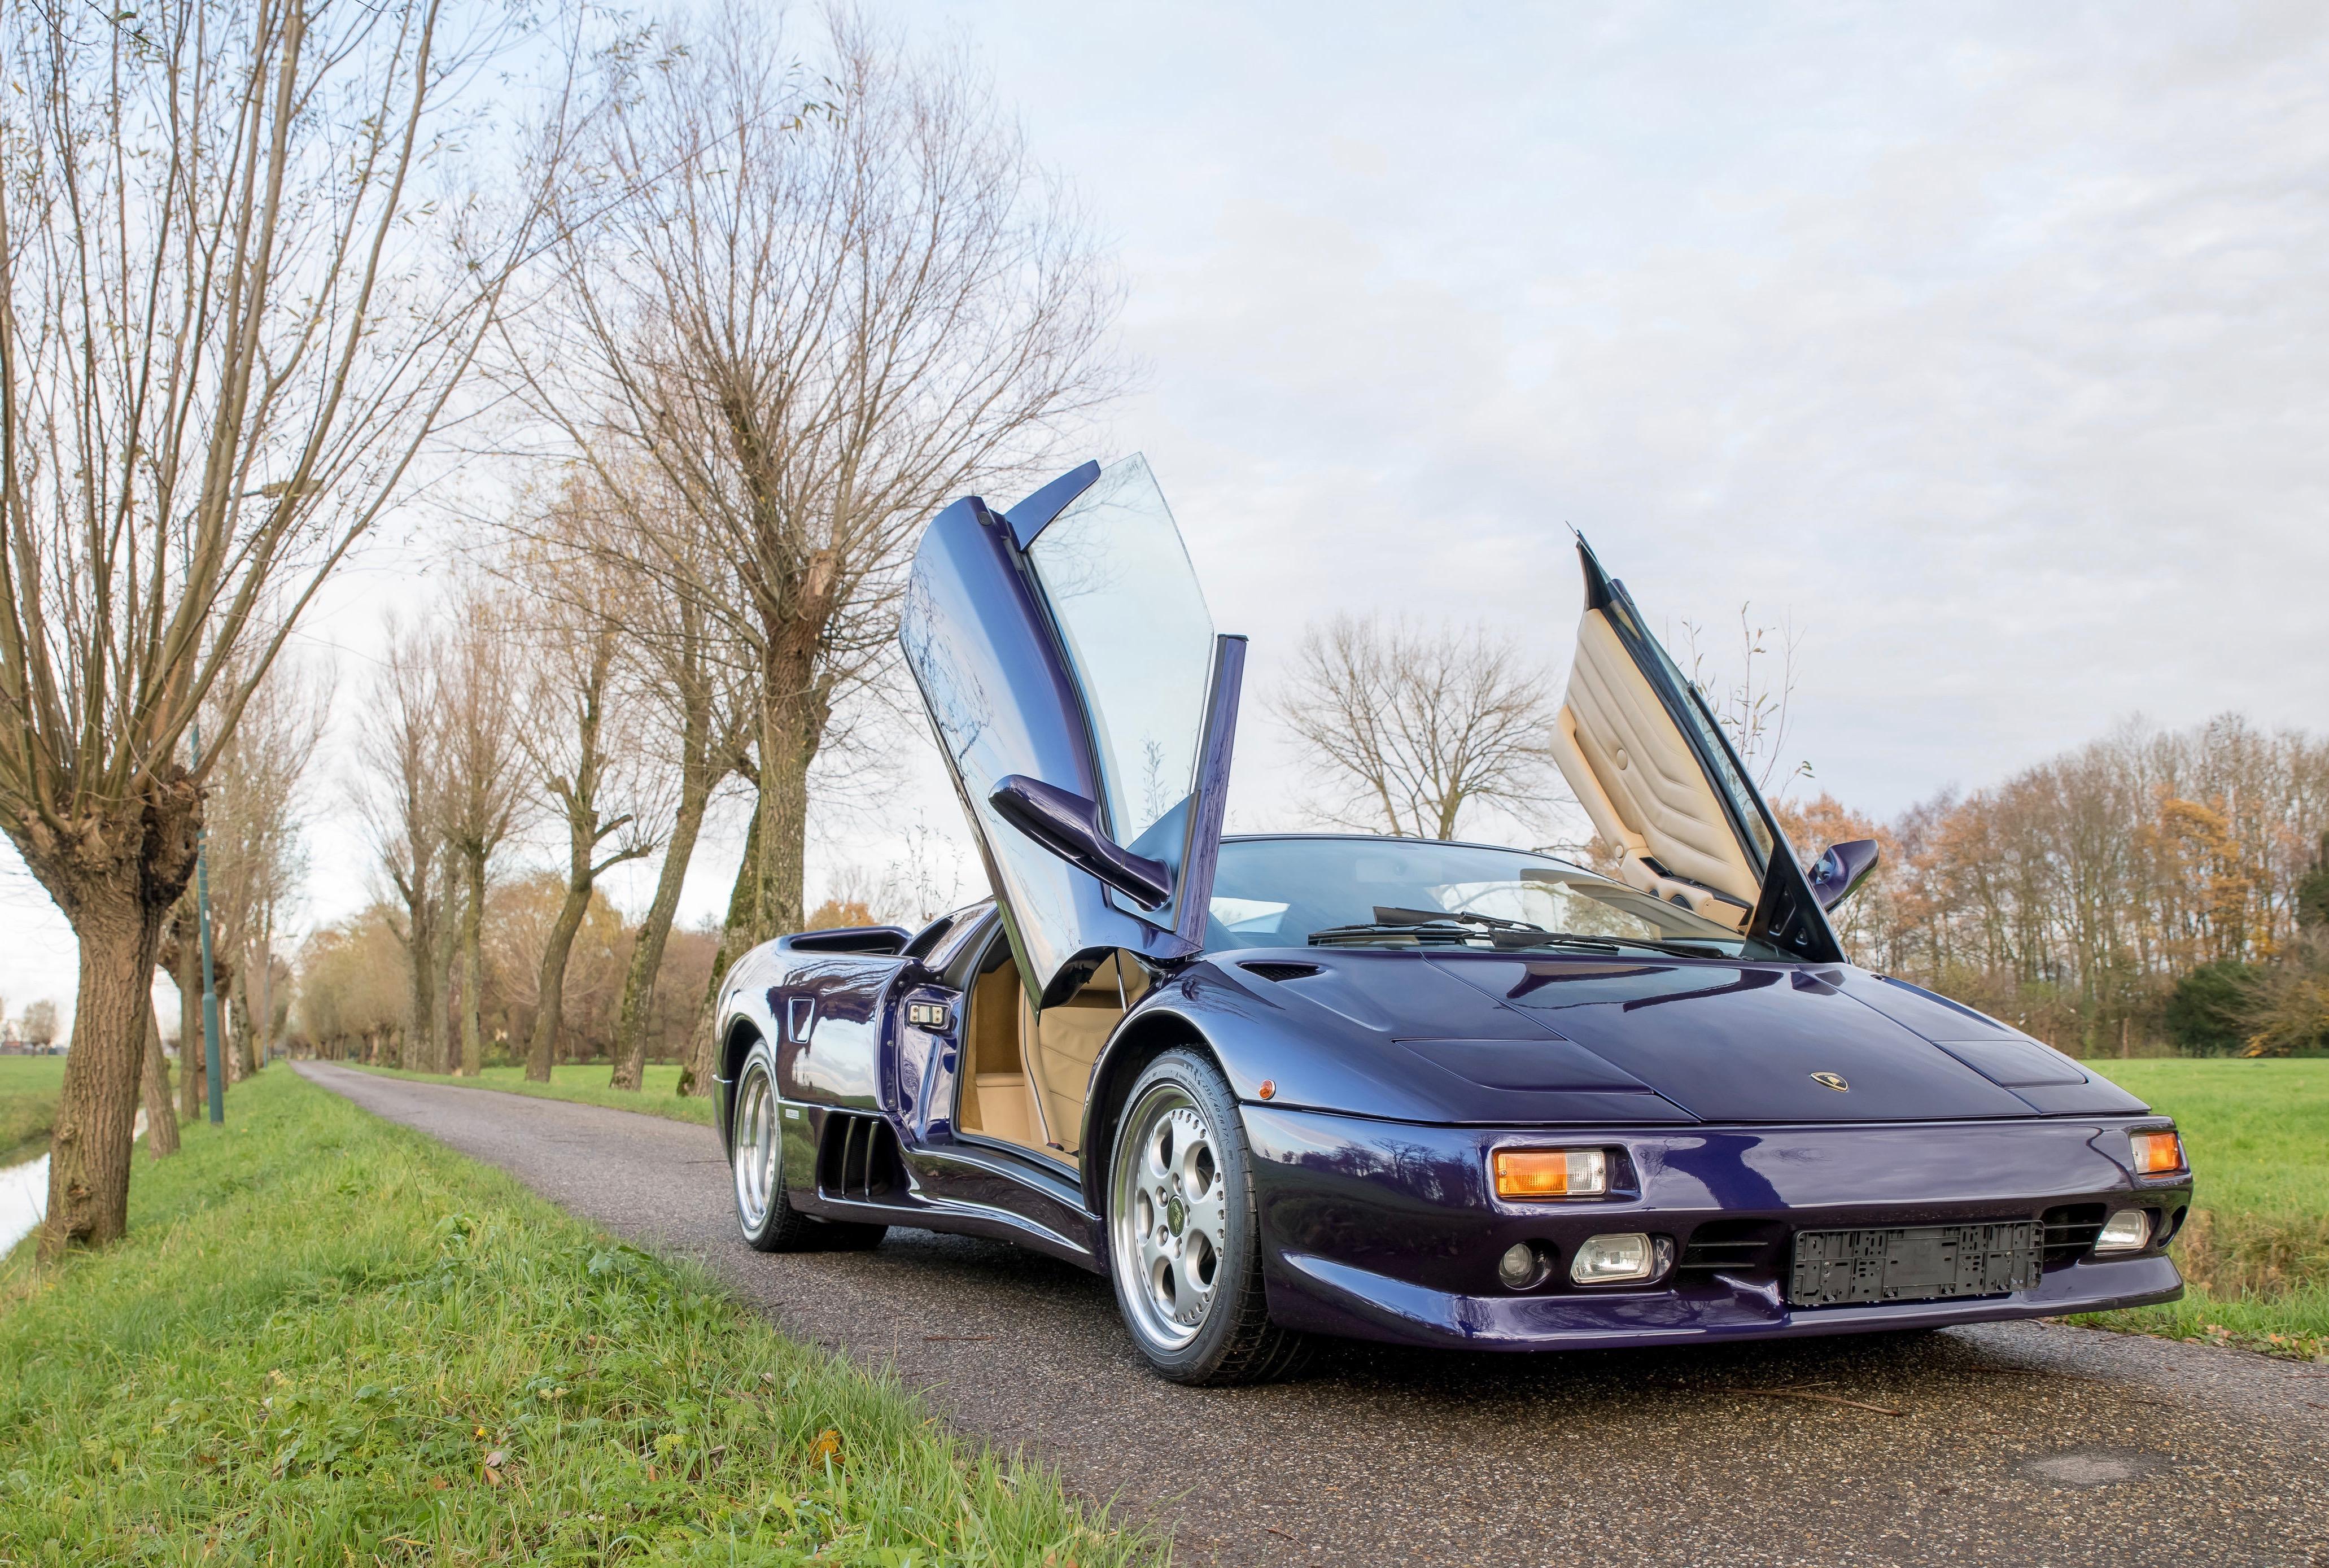 Bonhams, Bonhams boasts of Lamborghini lineup for its Paris auction, ClassicCars.com Journal